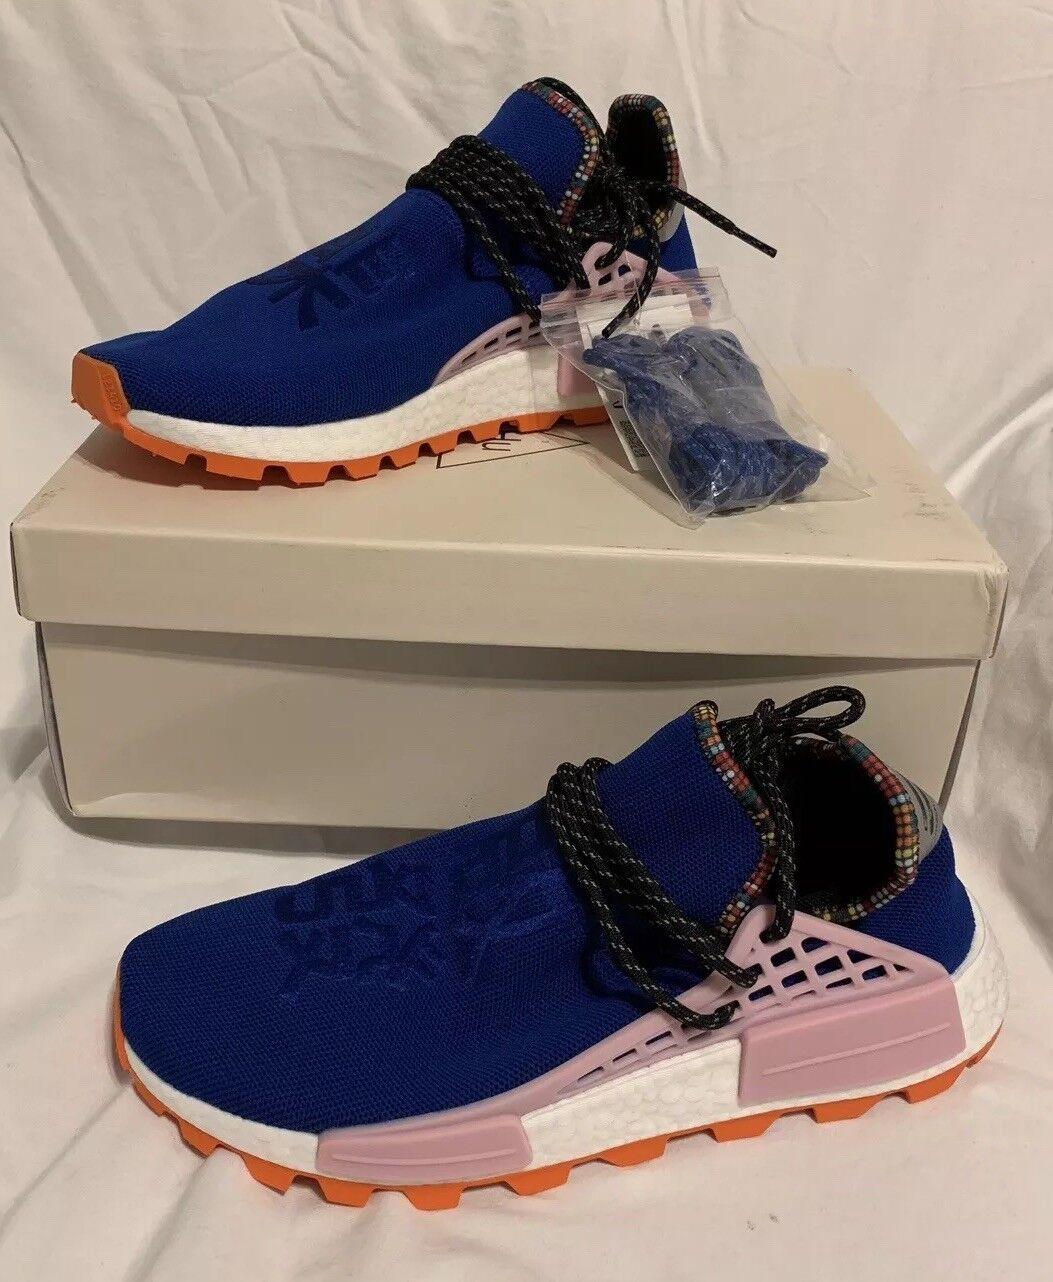 Adidas x Pharrell Williams Solar HU NMD bluee Size US 9.5 EE7579 BNIB